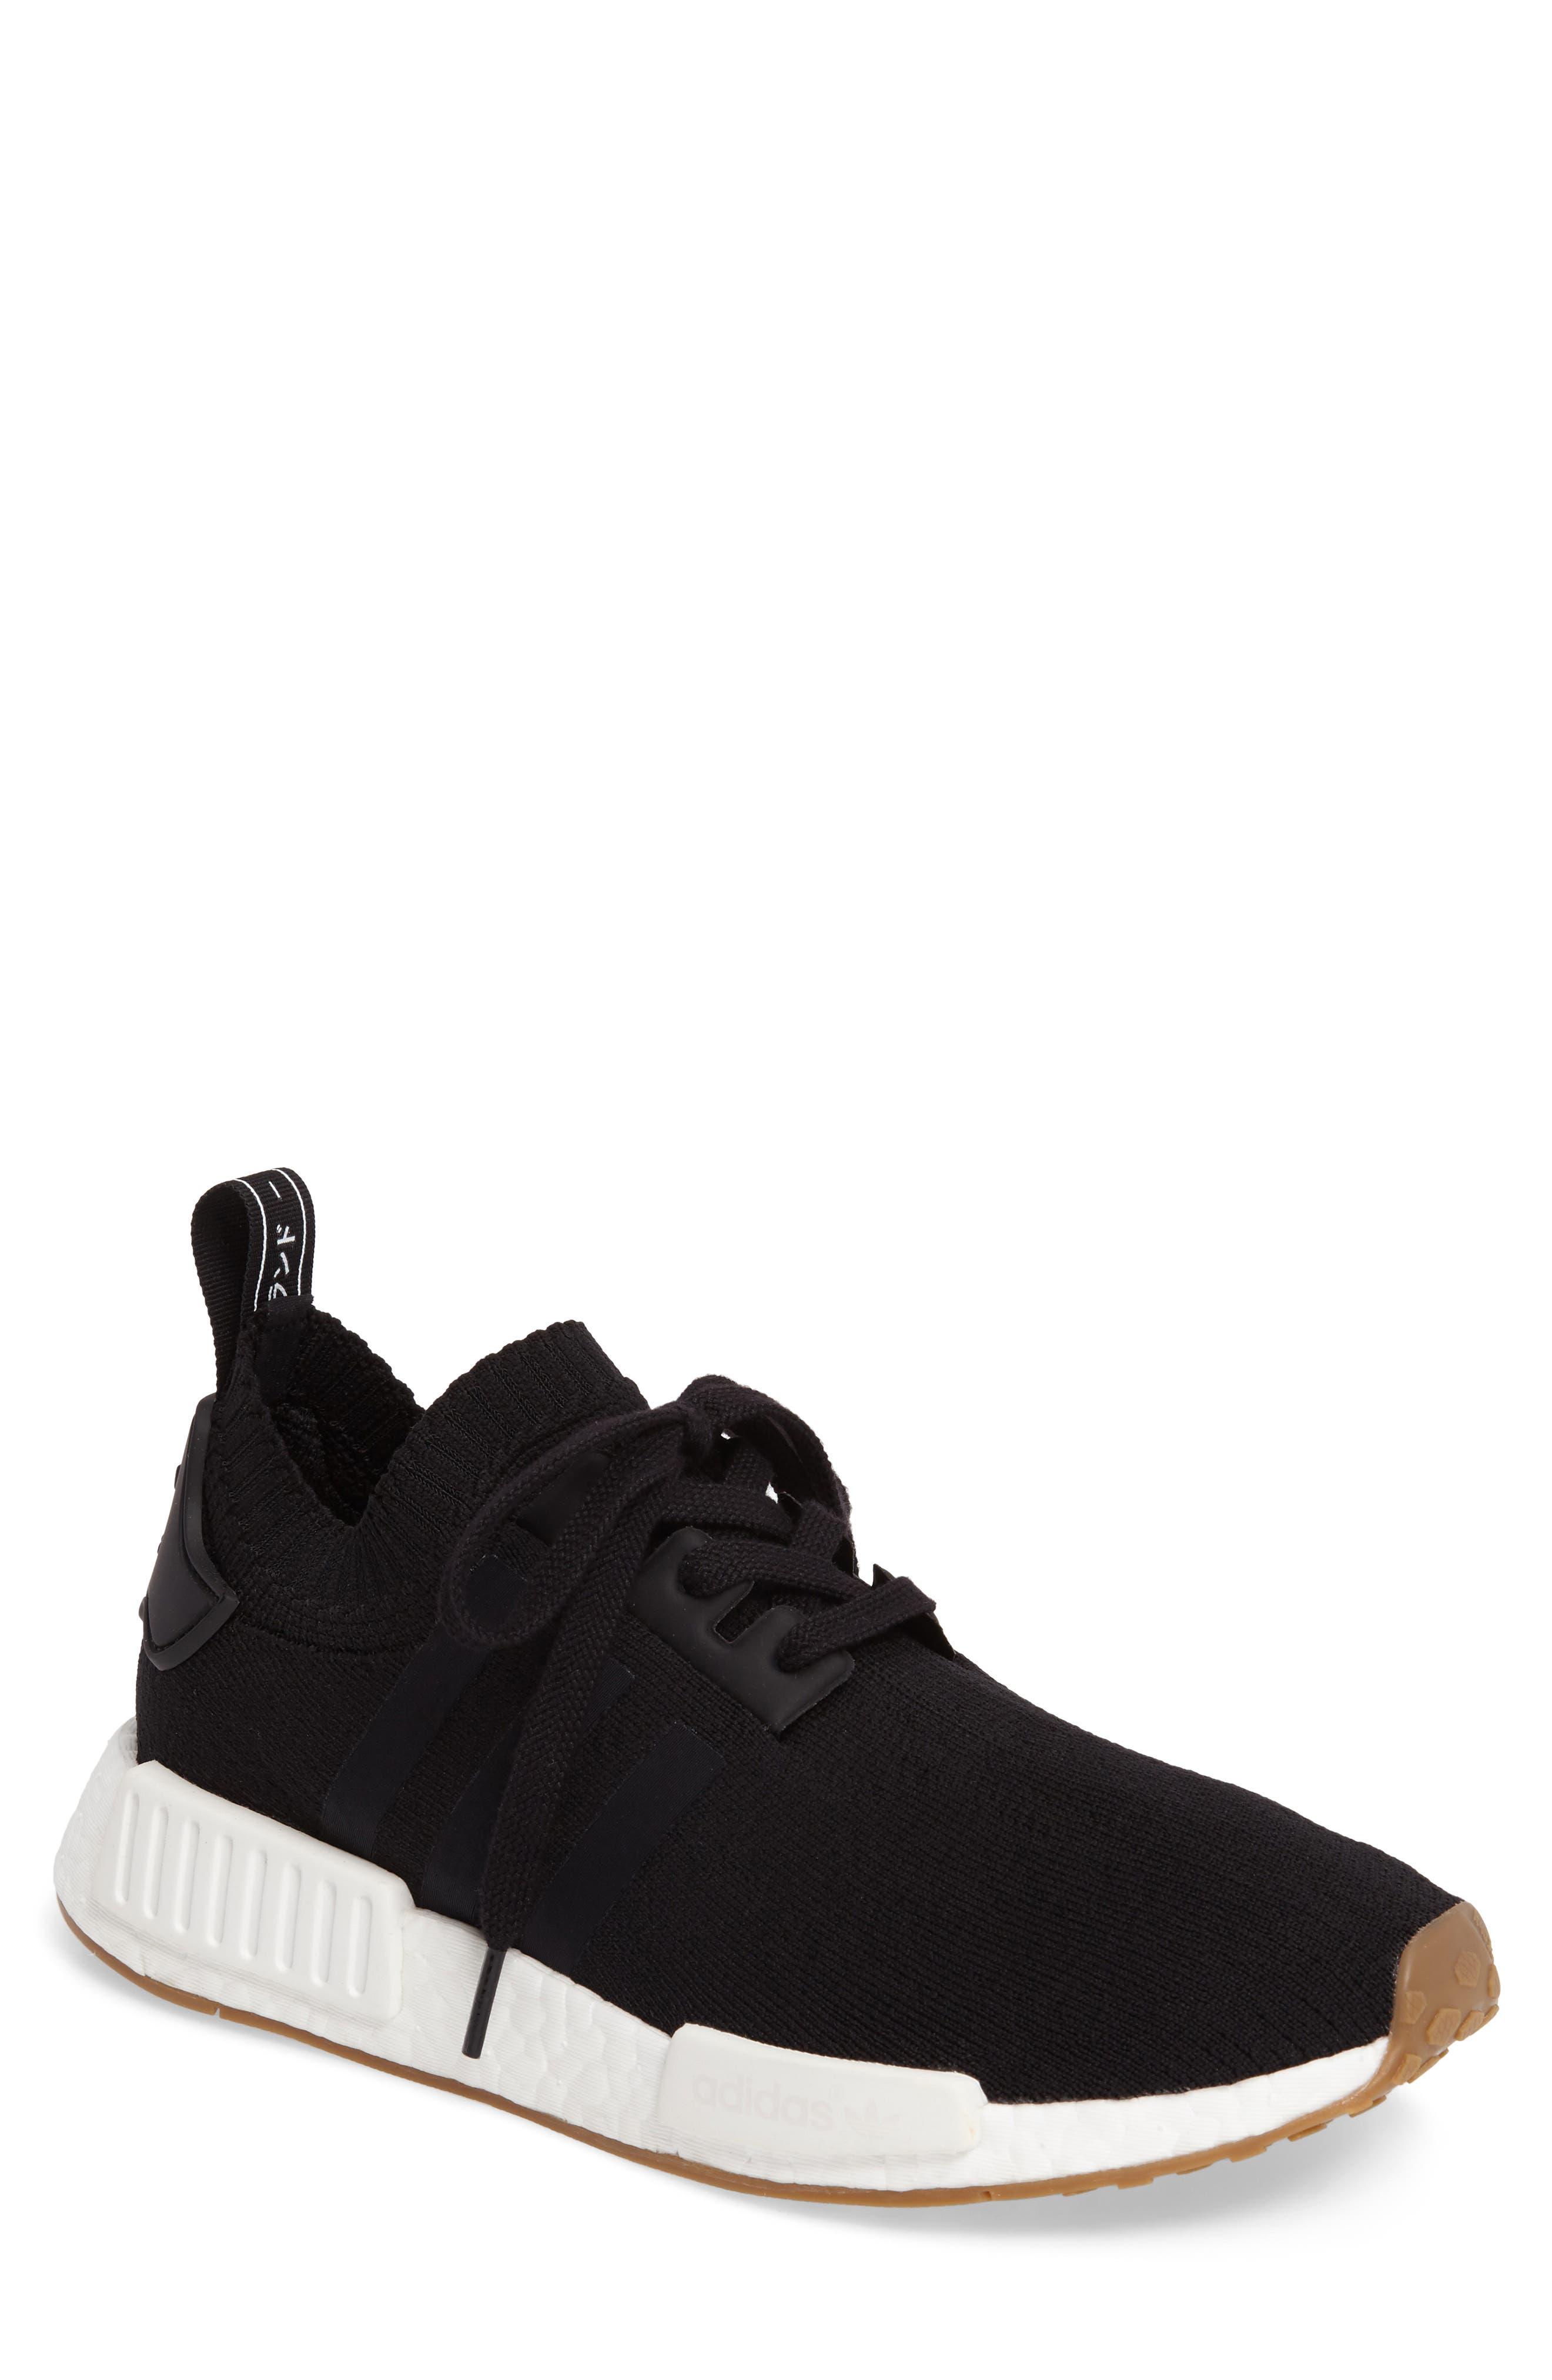 NMD R1 Primeknit Sneaker,                             Main thumbnail 1, color,                             002